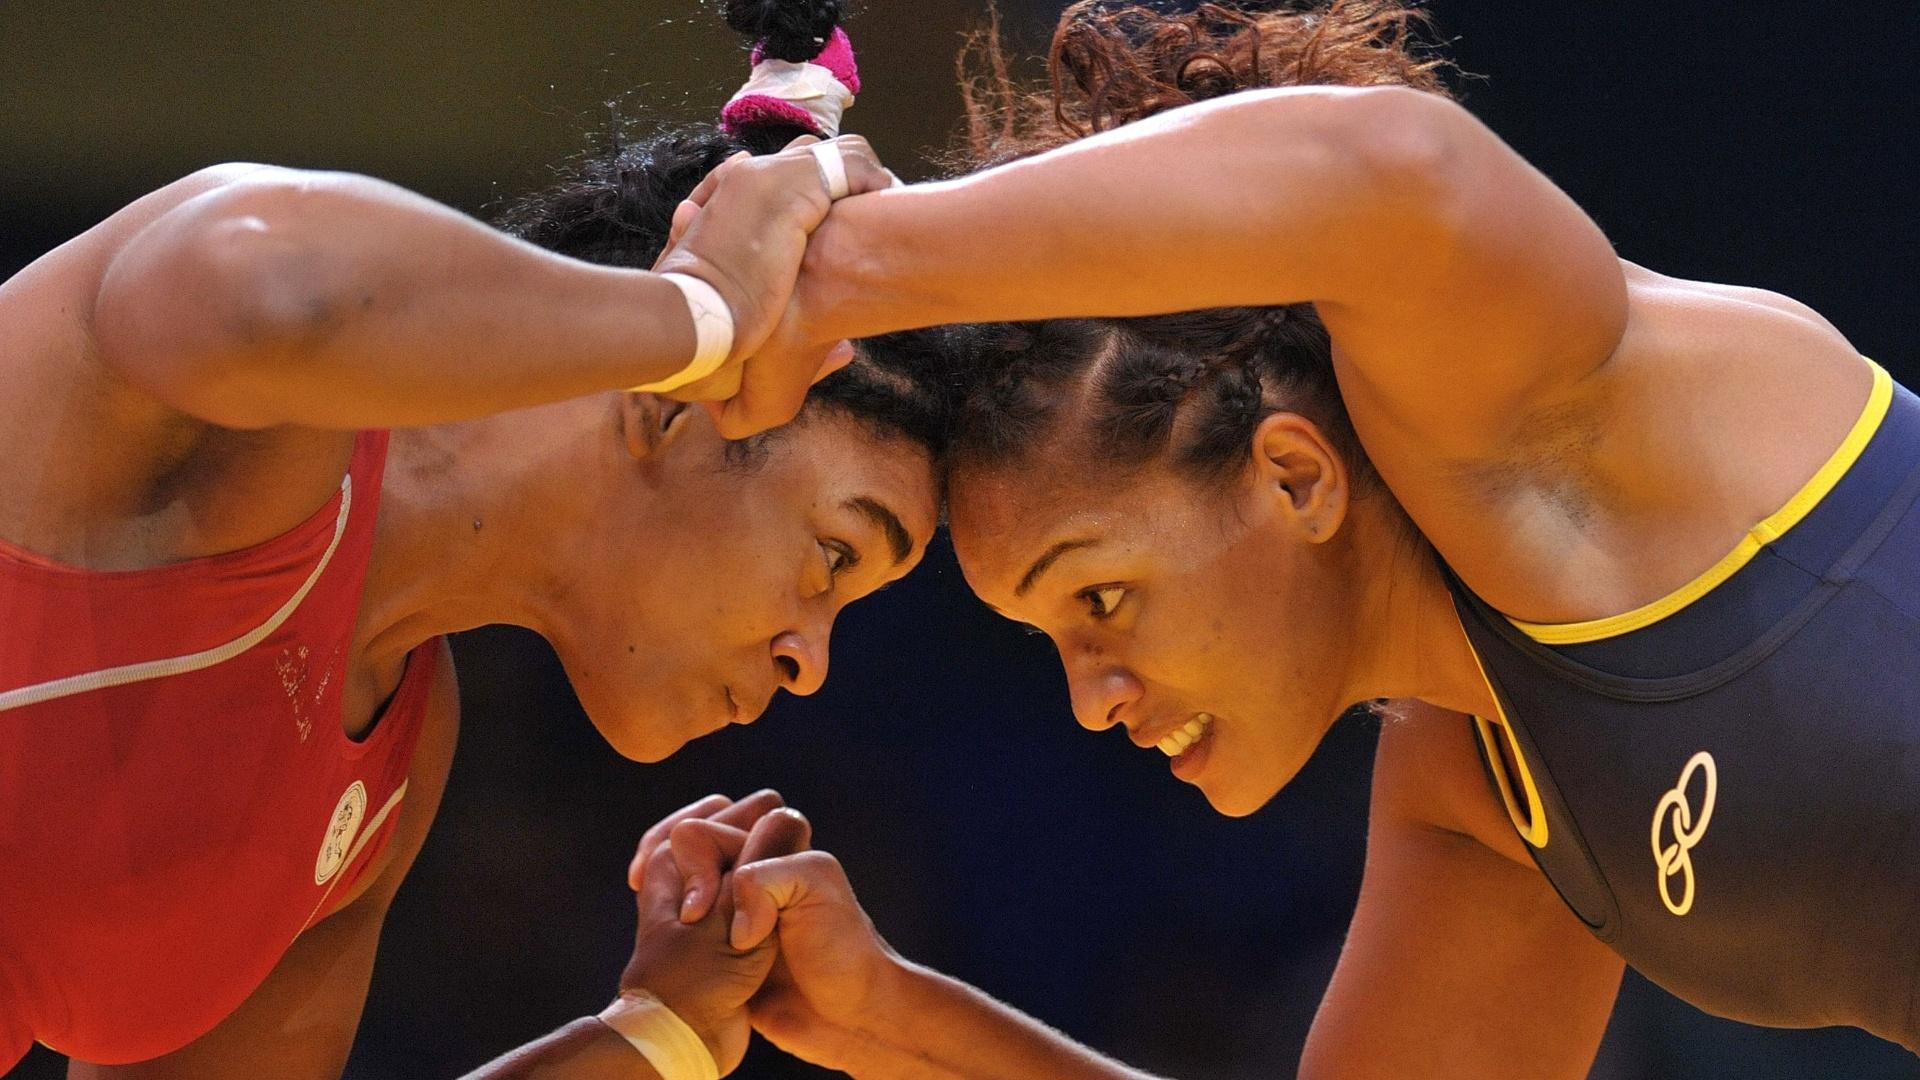 Lisset Hechevarria, de Cuba, e a brasileira Aline Ferreira se enfrentam na luta olímpica